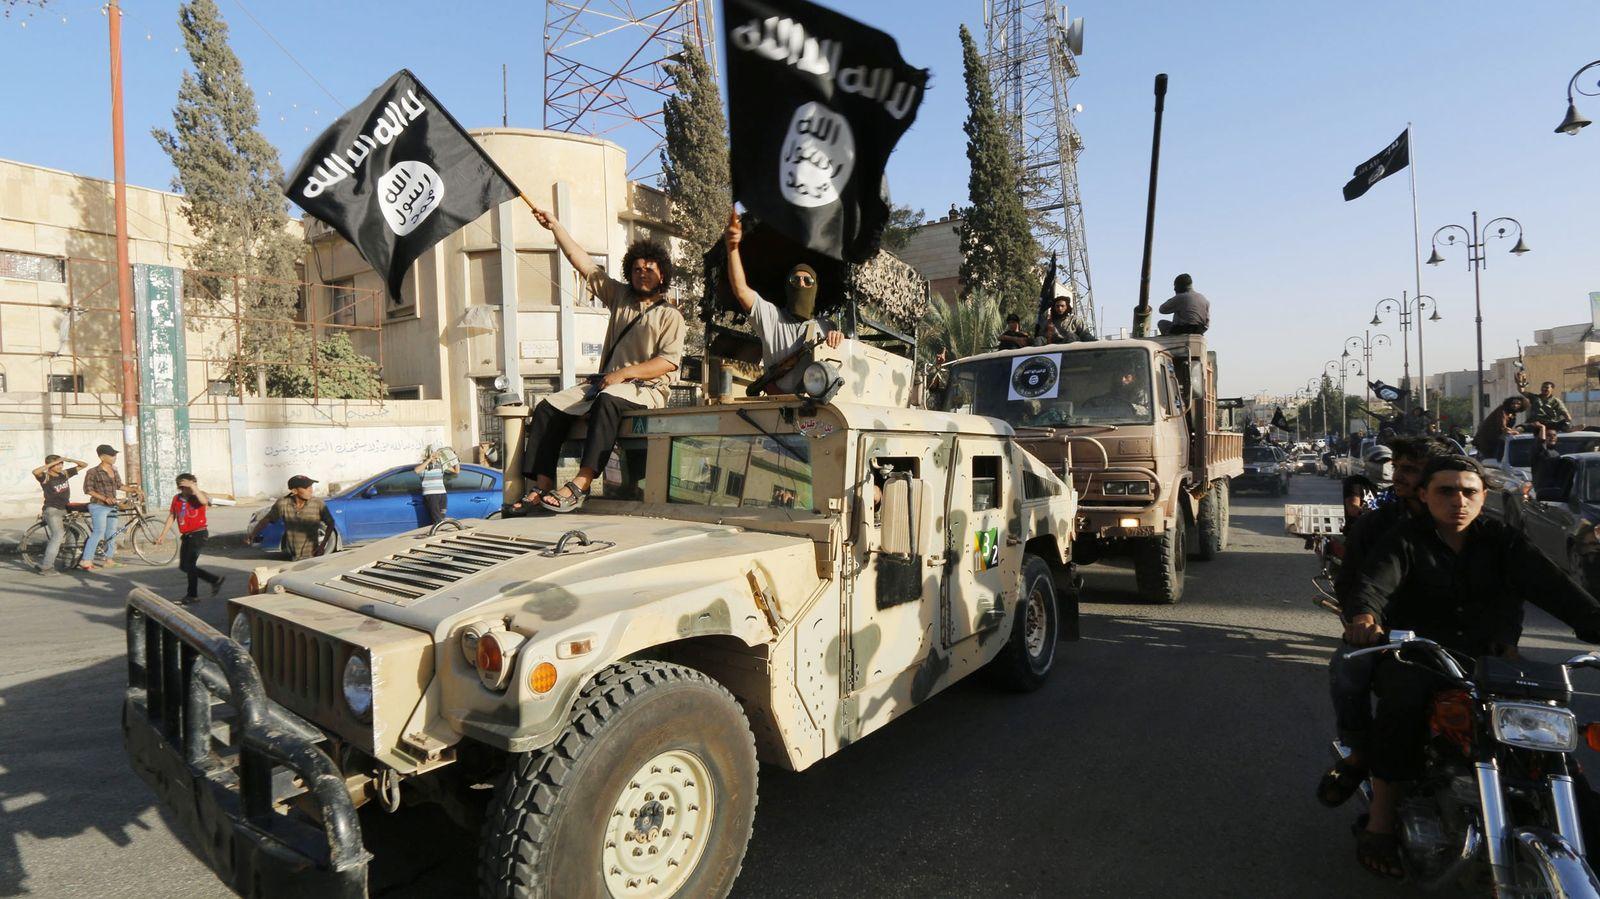 Islamischer Staat / ISIS / ISIL